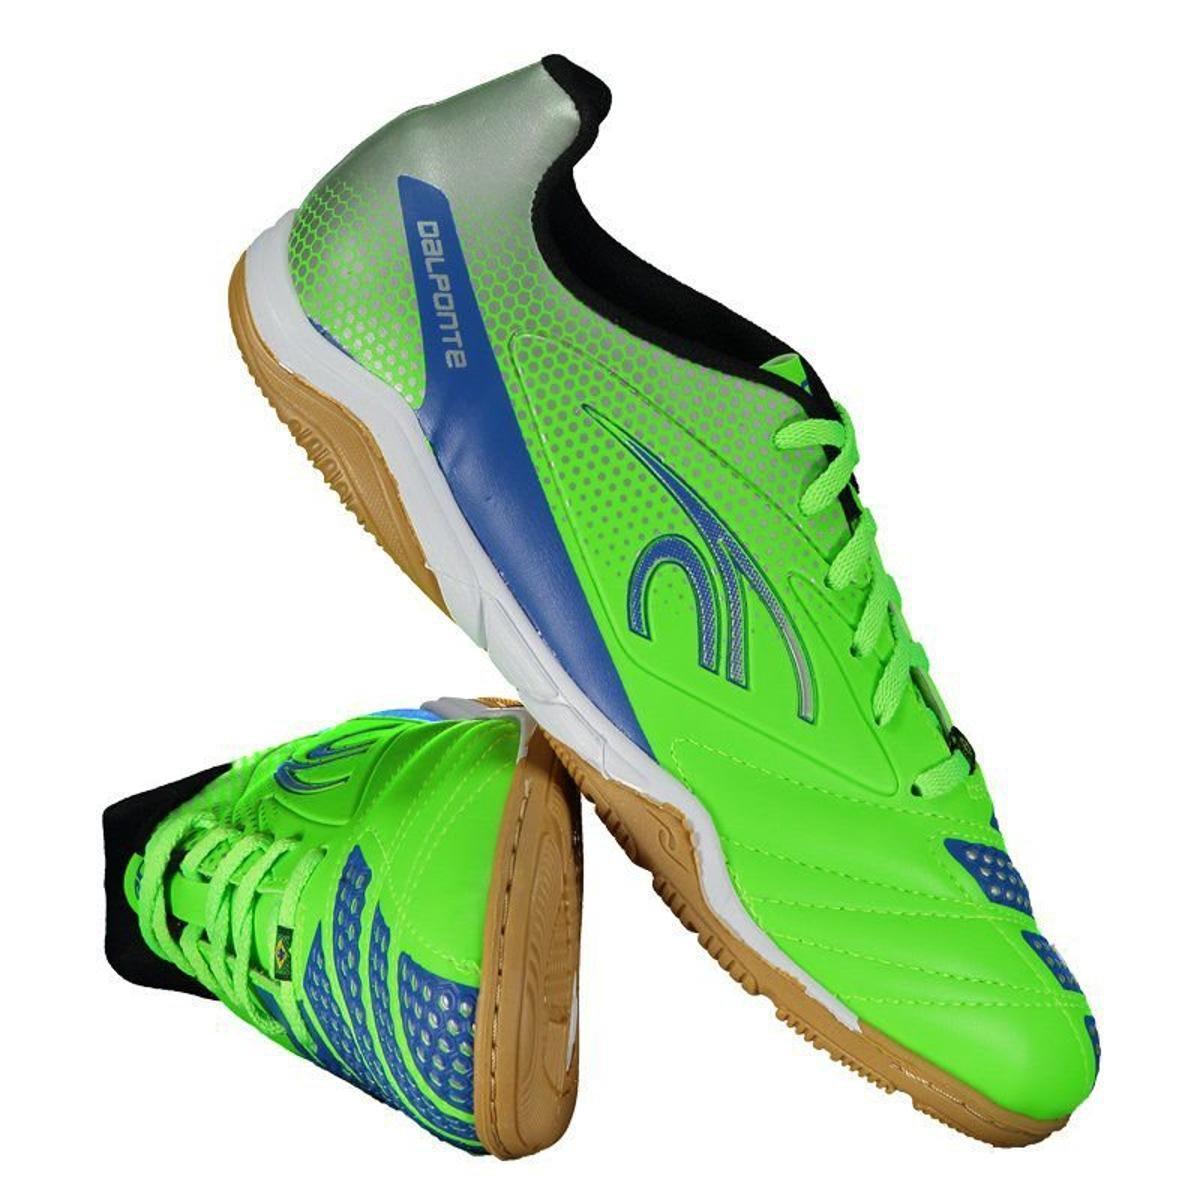 9a897a294bc0d Chuteira Futsal Dalponte Twister Masculina - Verde - Compre Agora ...